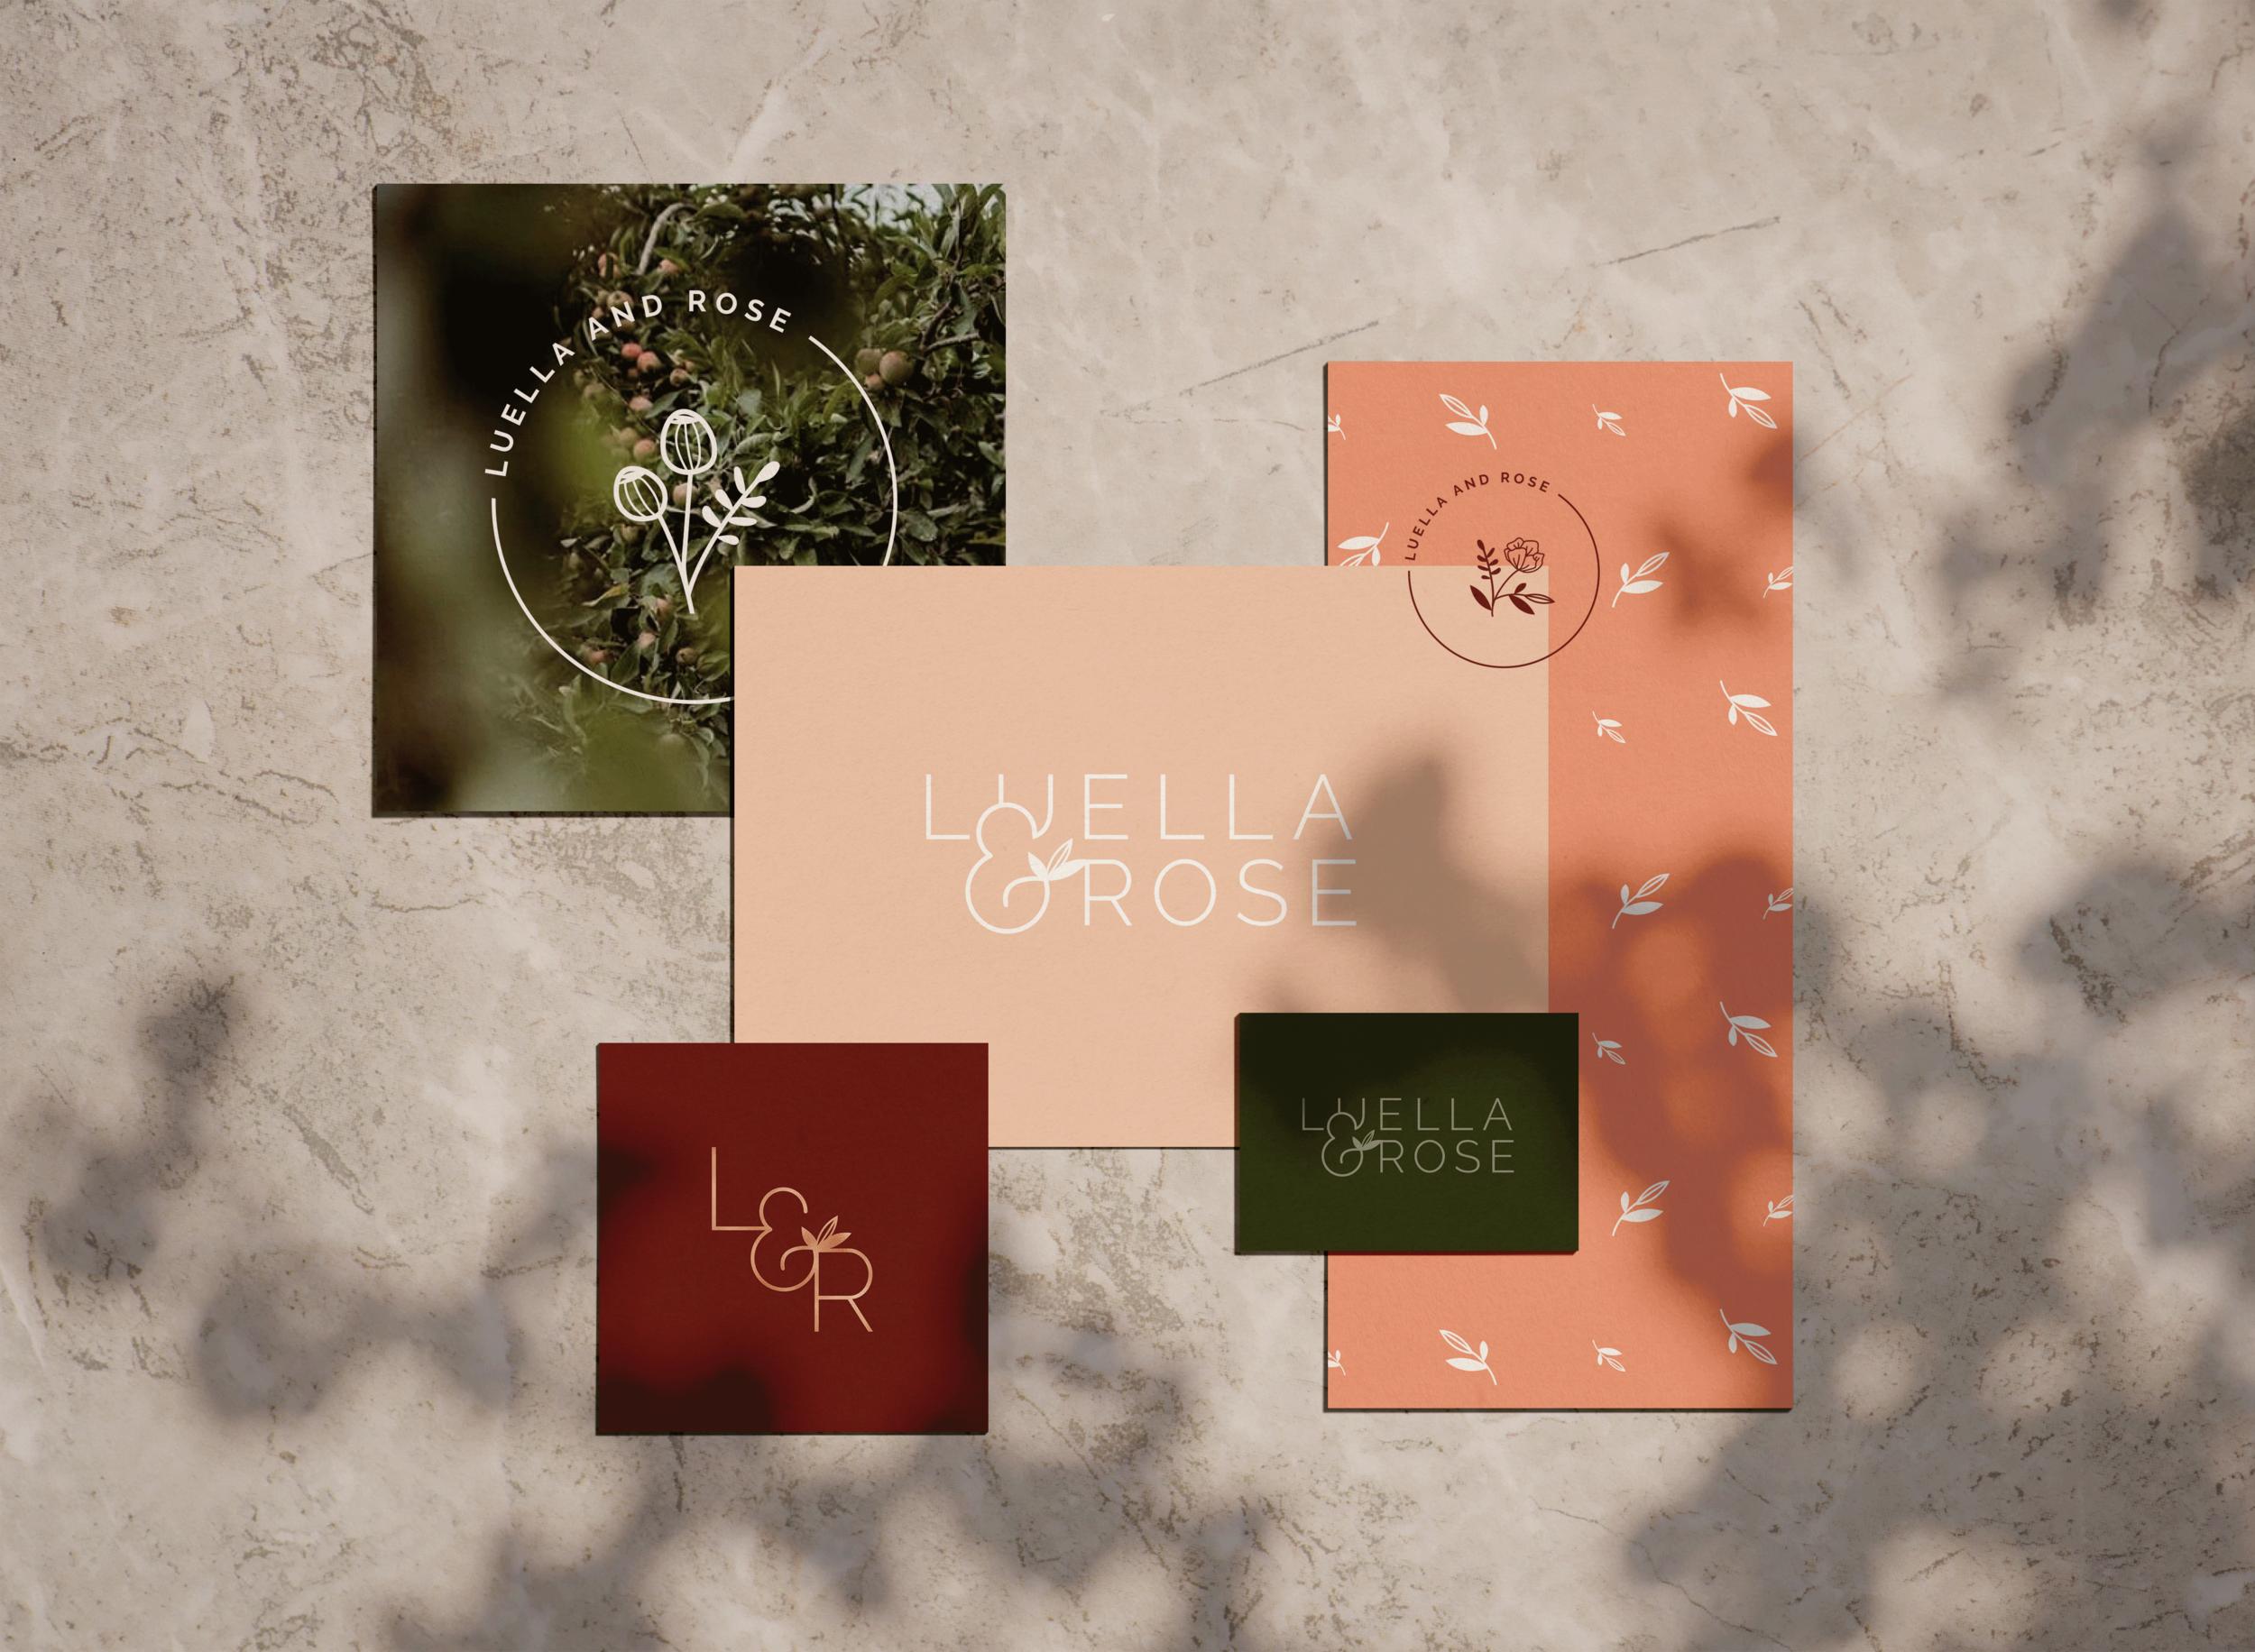 Luella&rose_brandsuite.png